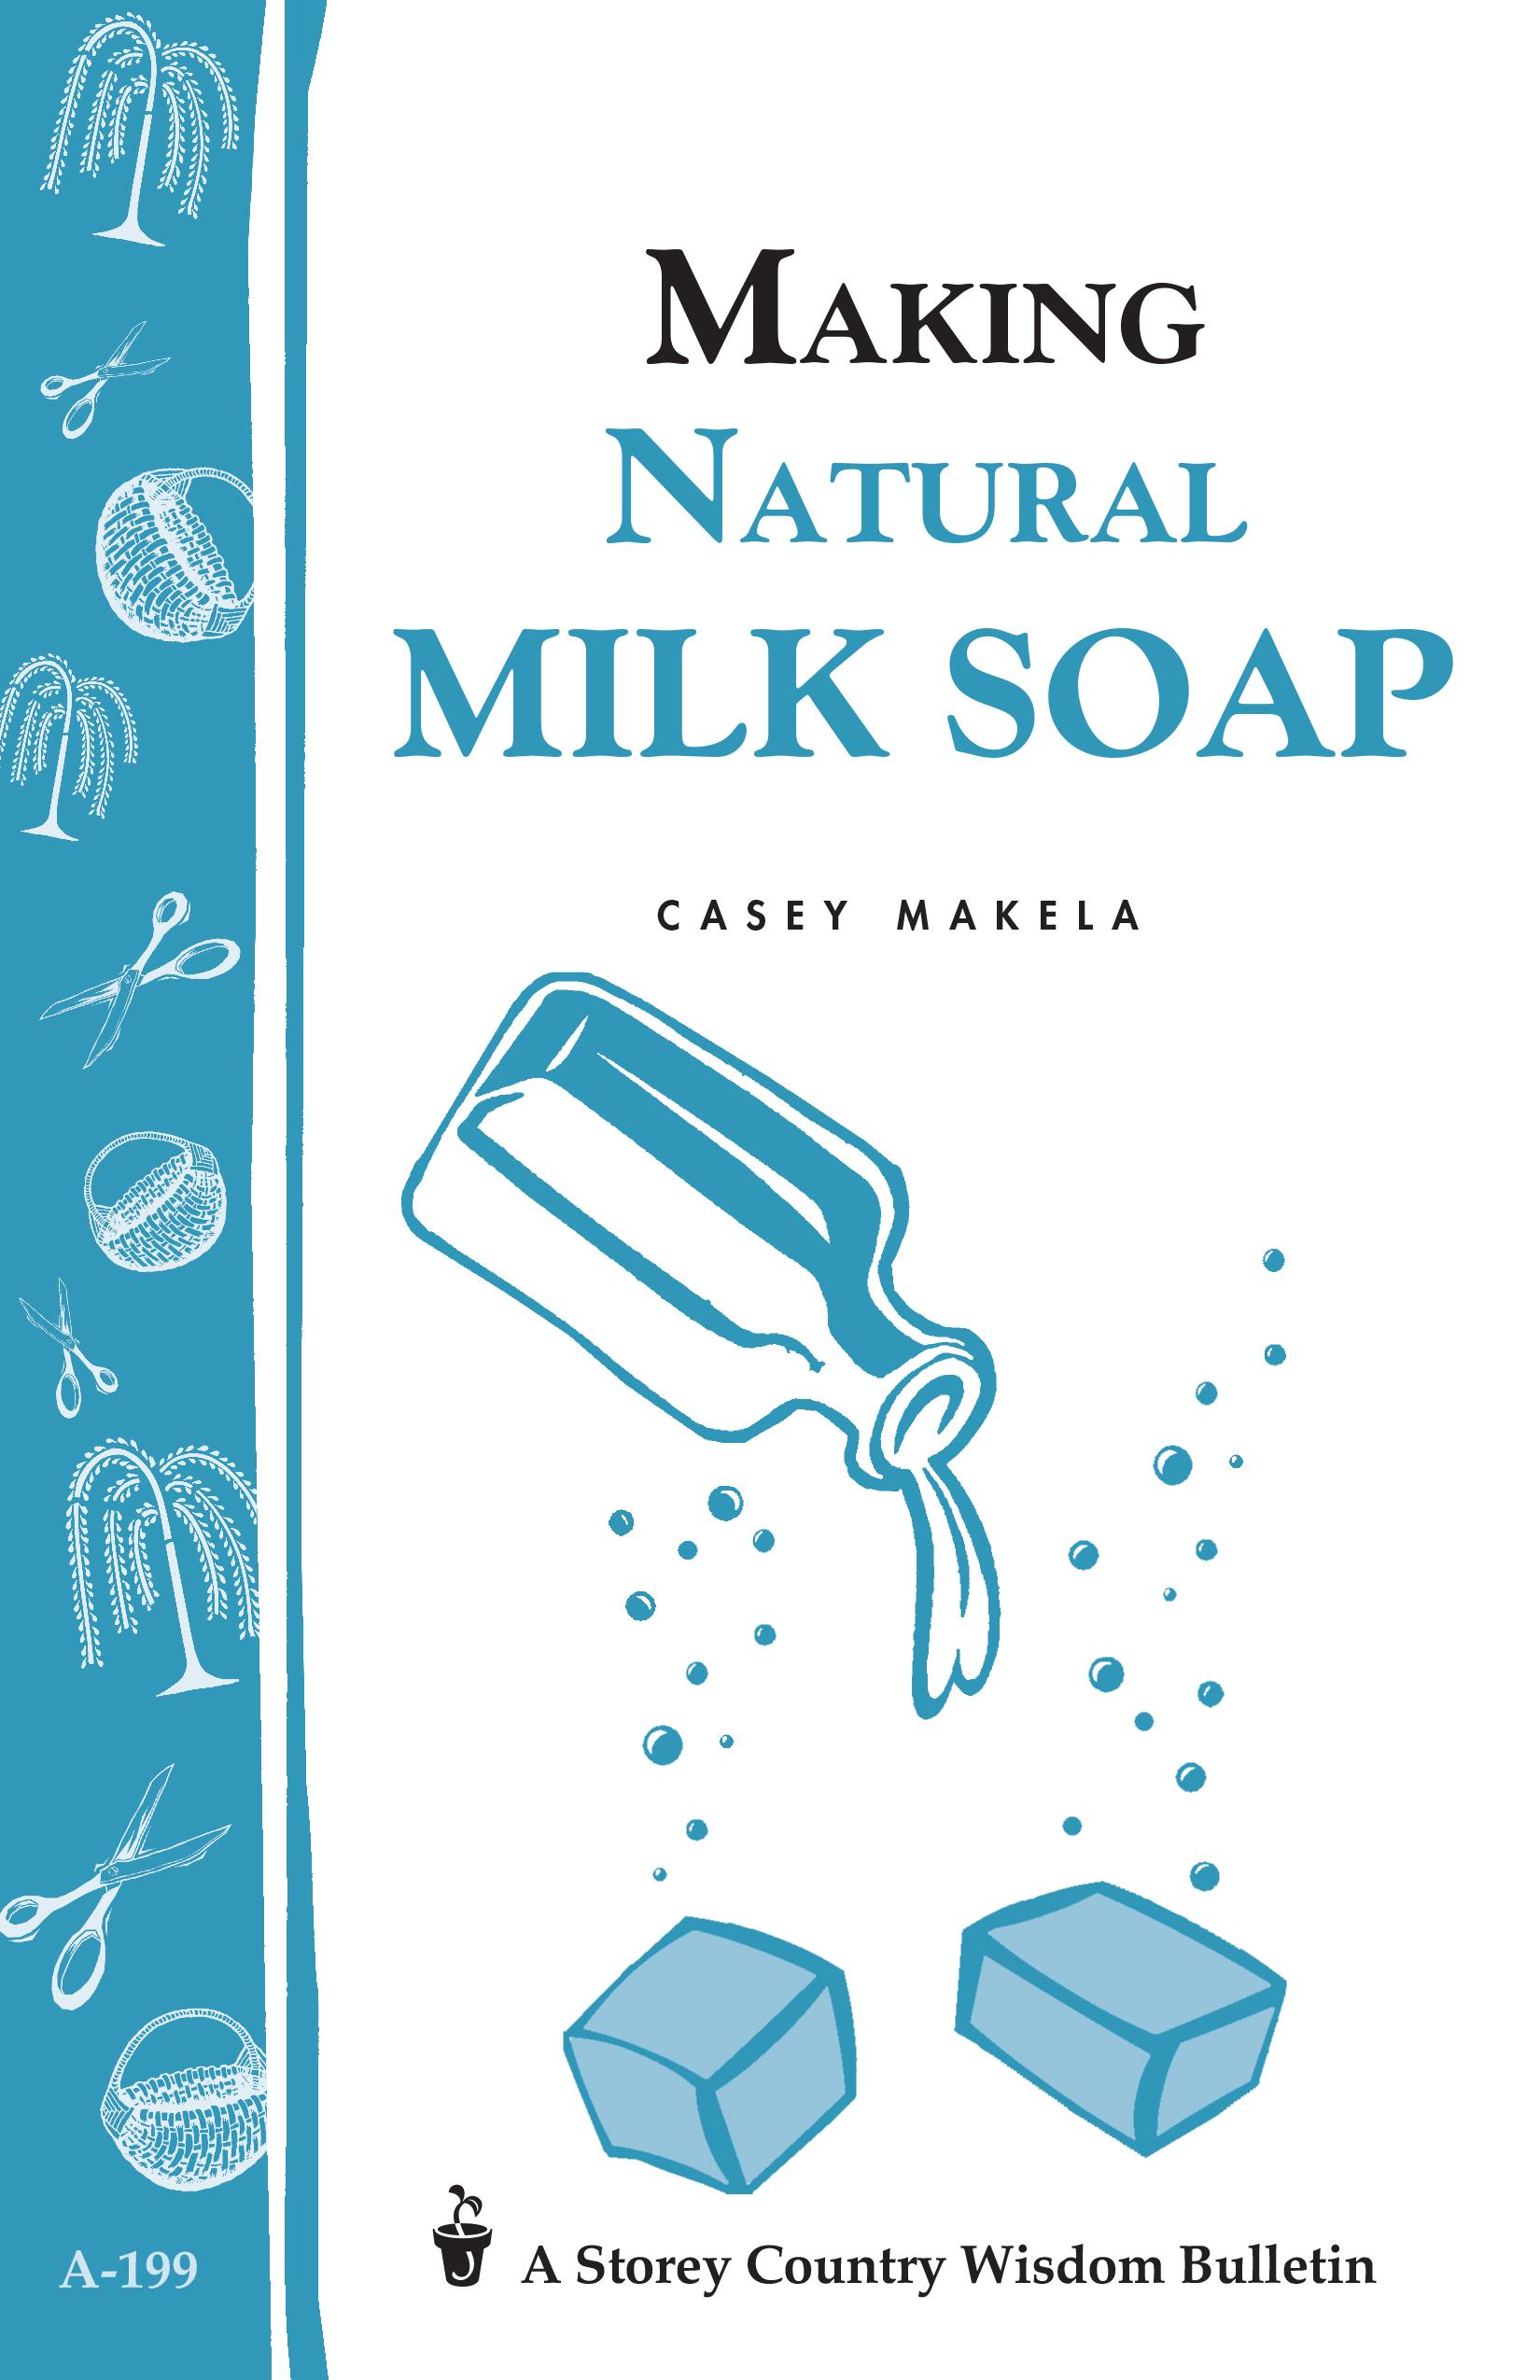 Making Natural Milk Soap Storey's Country Wisdom Bulletin A-199 - Casey Makela